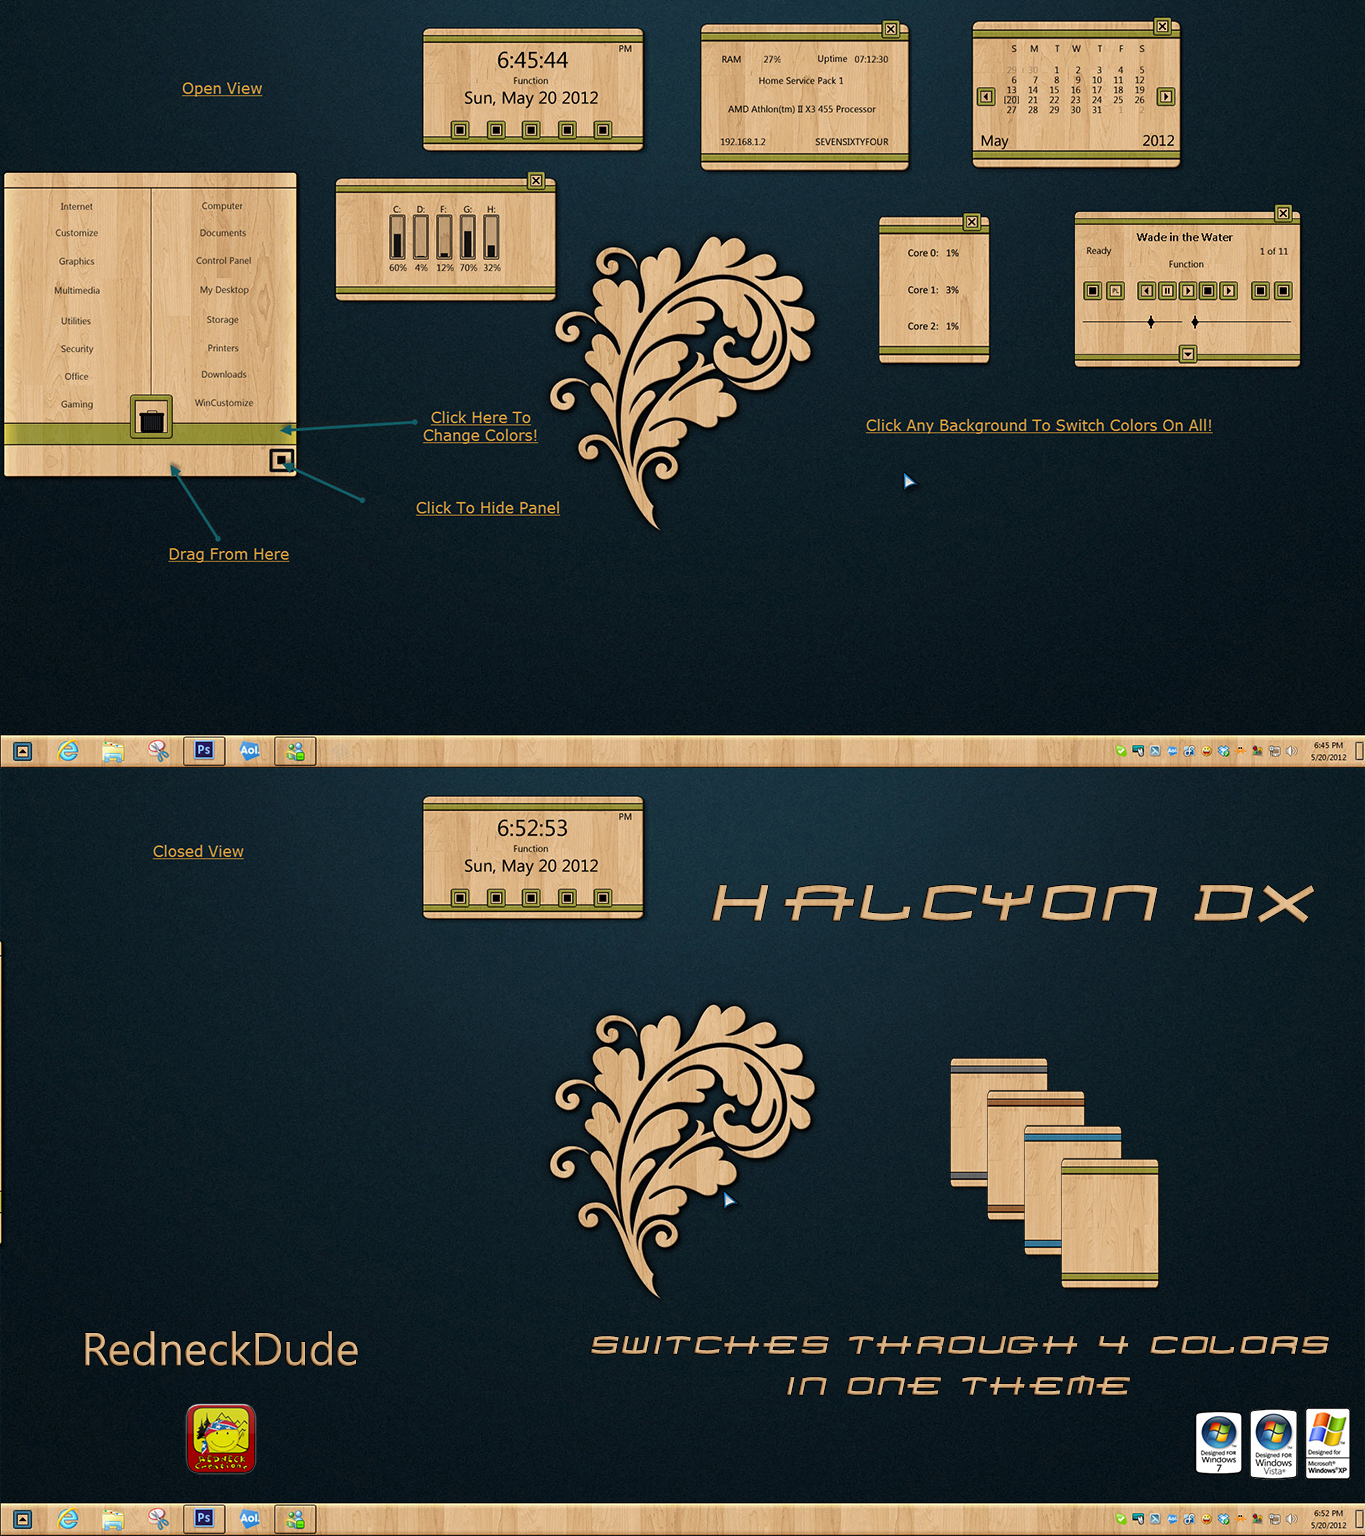 Halcyon DX